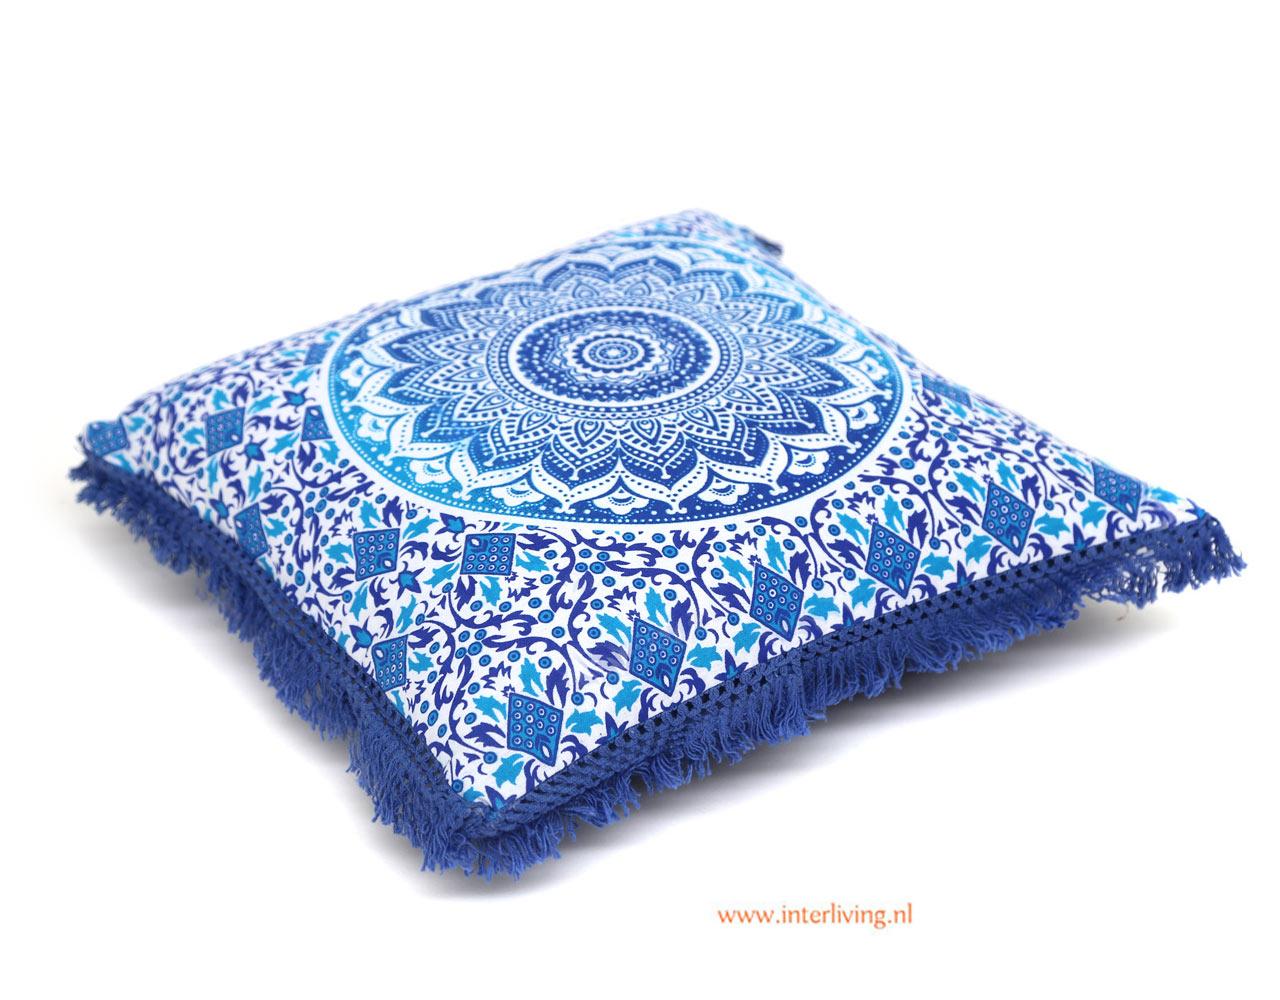 kussen--katoen-mandala--blauw-wit-print-vierkant-franje-rand